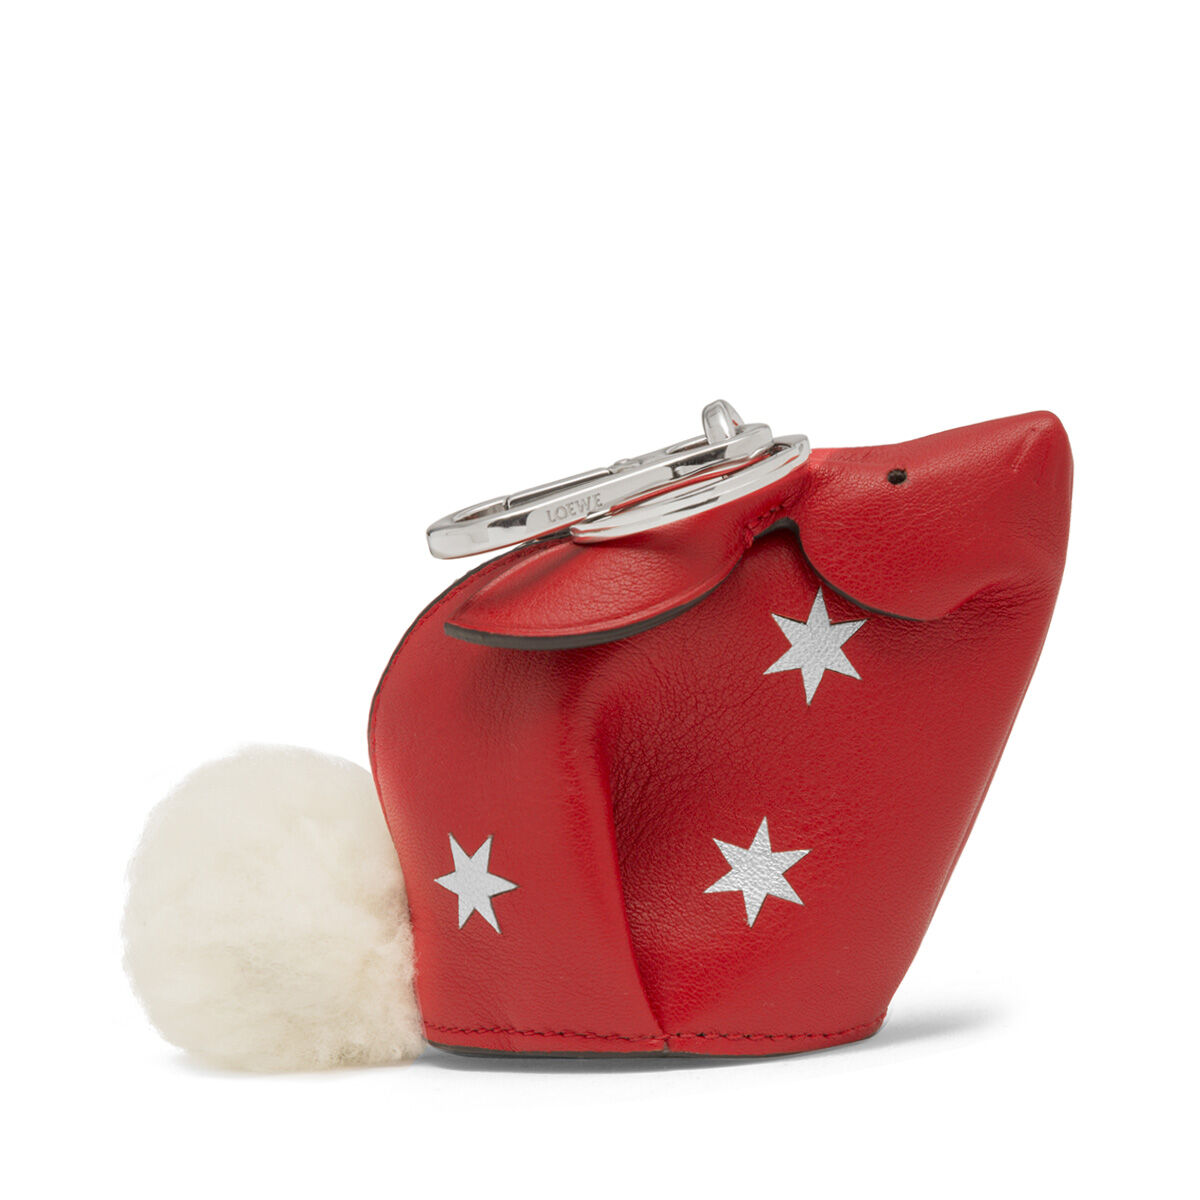 LOEWE Charm Conejo Estrellas Rojo Escarlata/Plata all